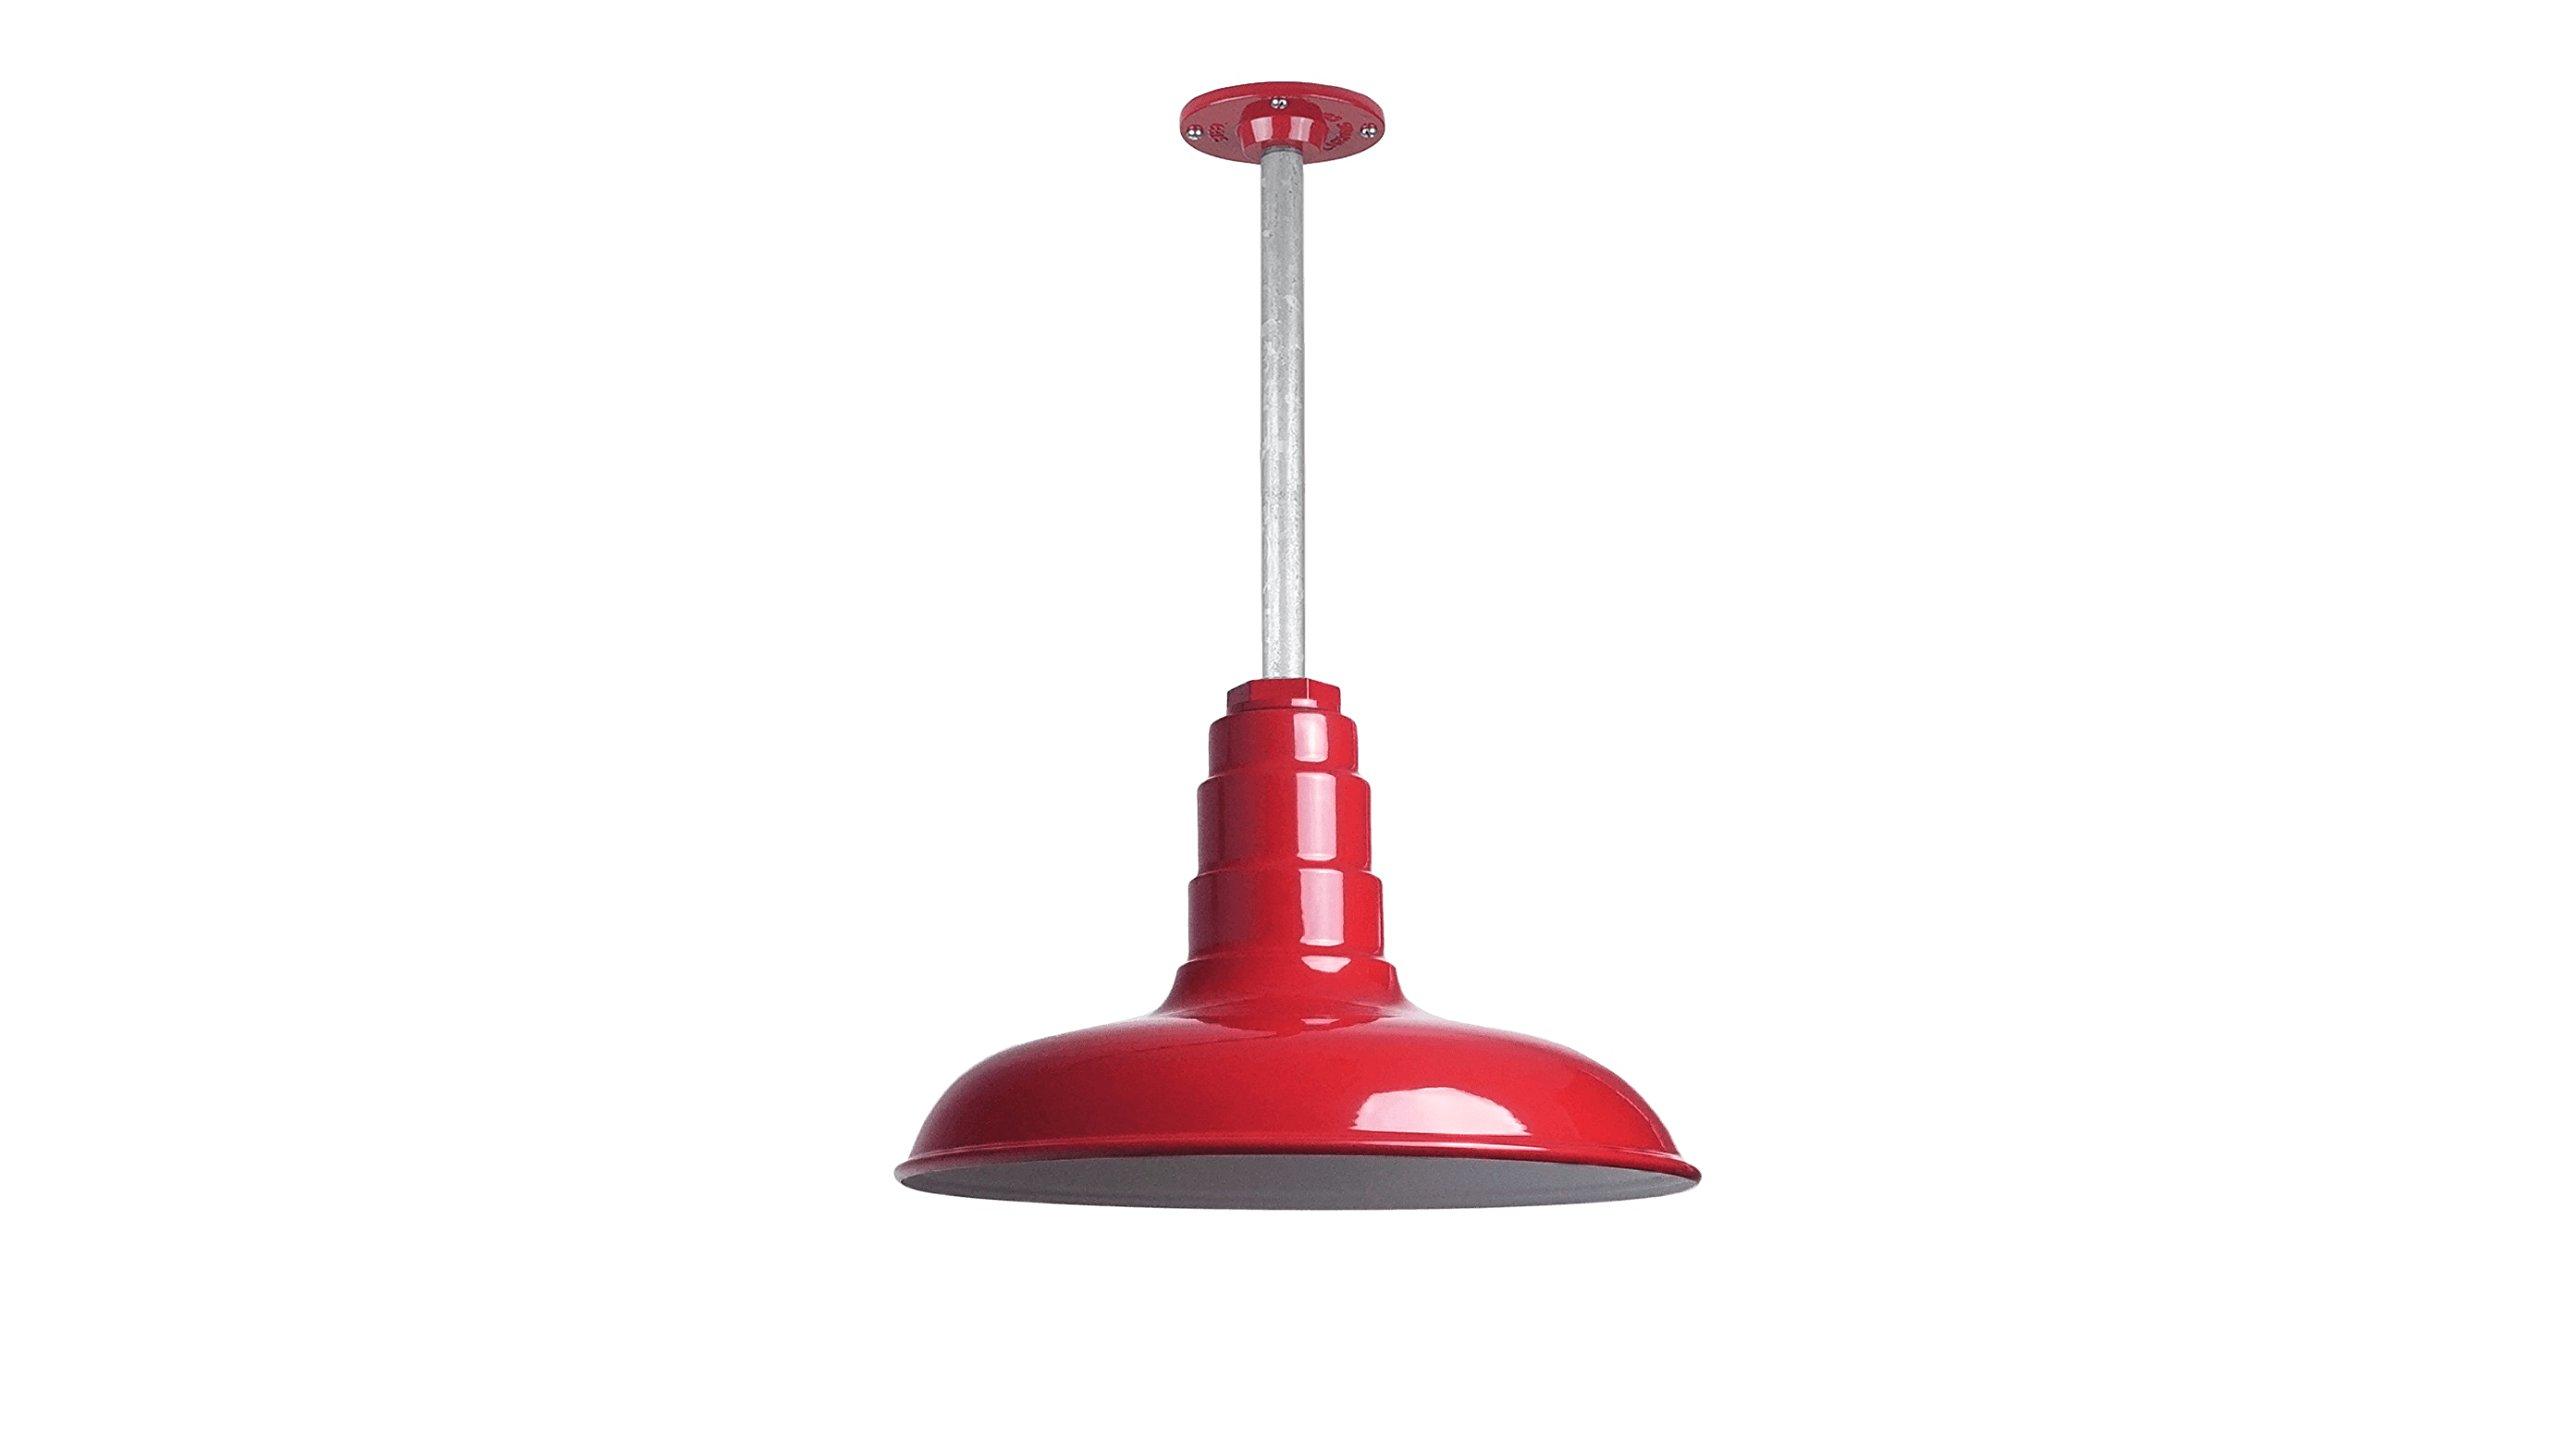 The Malibu Modern Farmhouse Pendant Light | Steel Barn Light with Rigid Stem For Ceiling | Heavy Duty Steel Light | Made in America (Red)